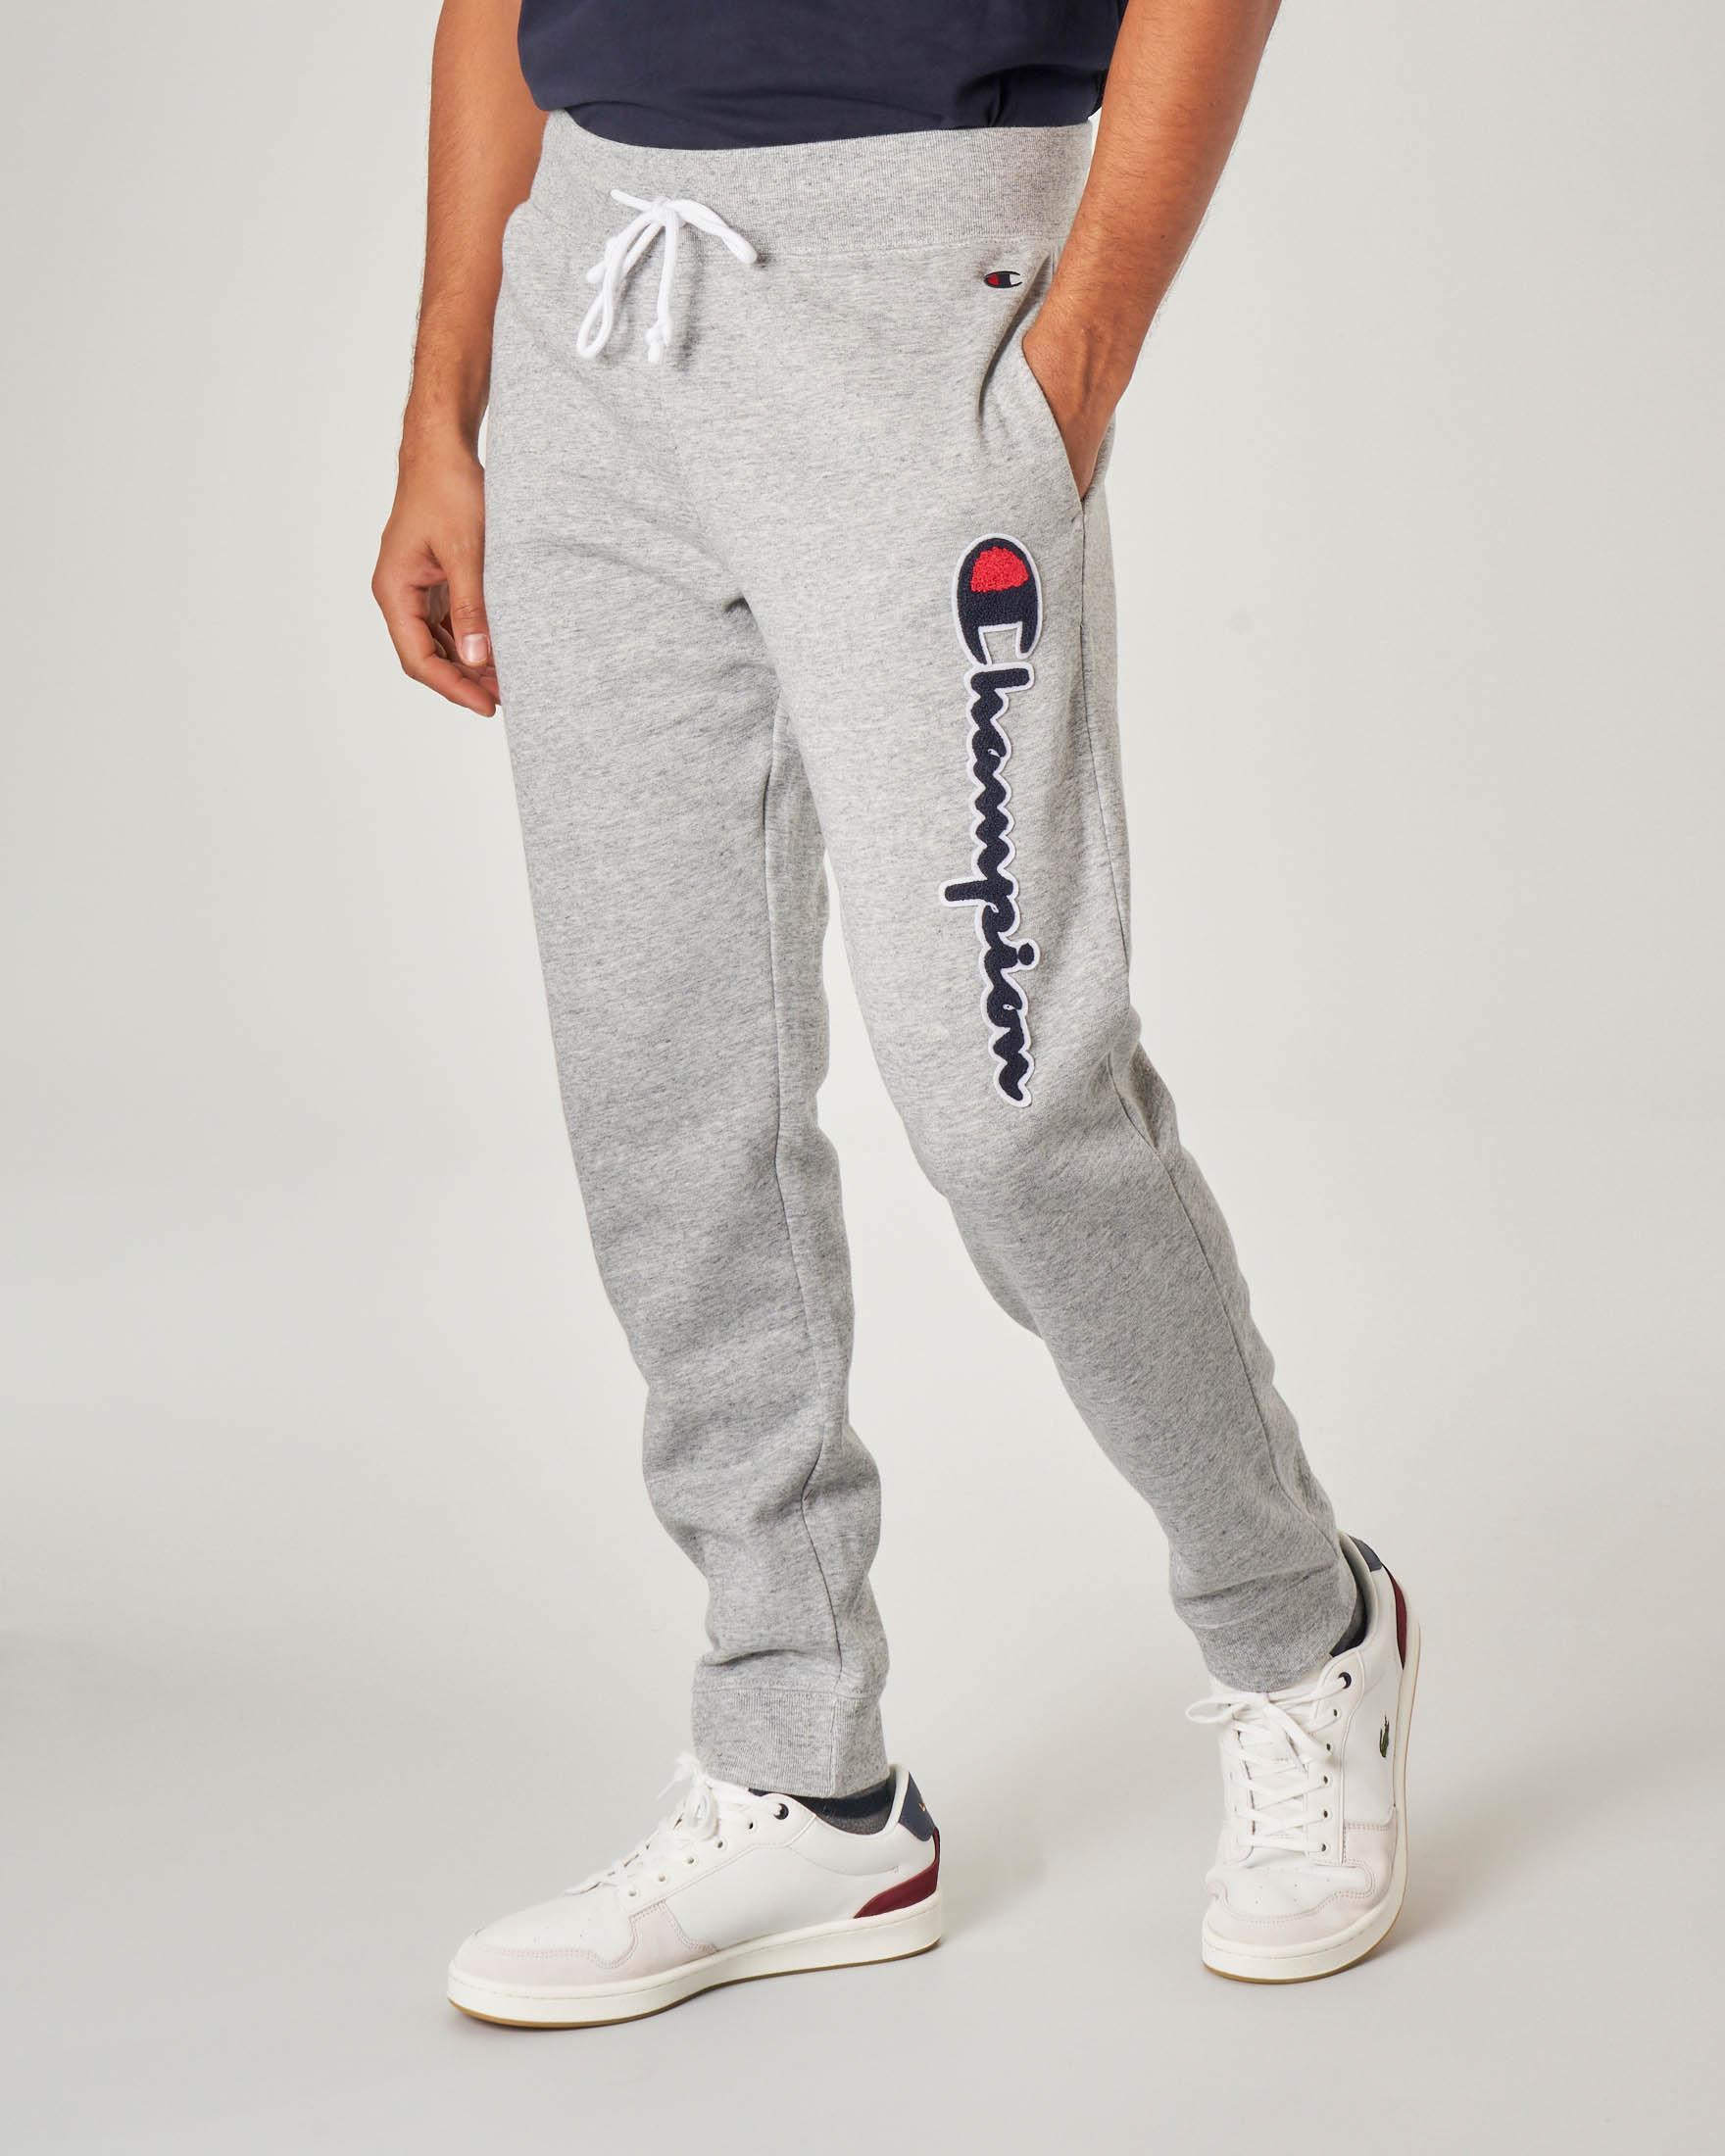 Pantalone grigio melange in felpa con logo in spugna